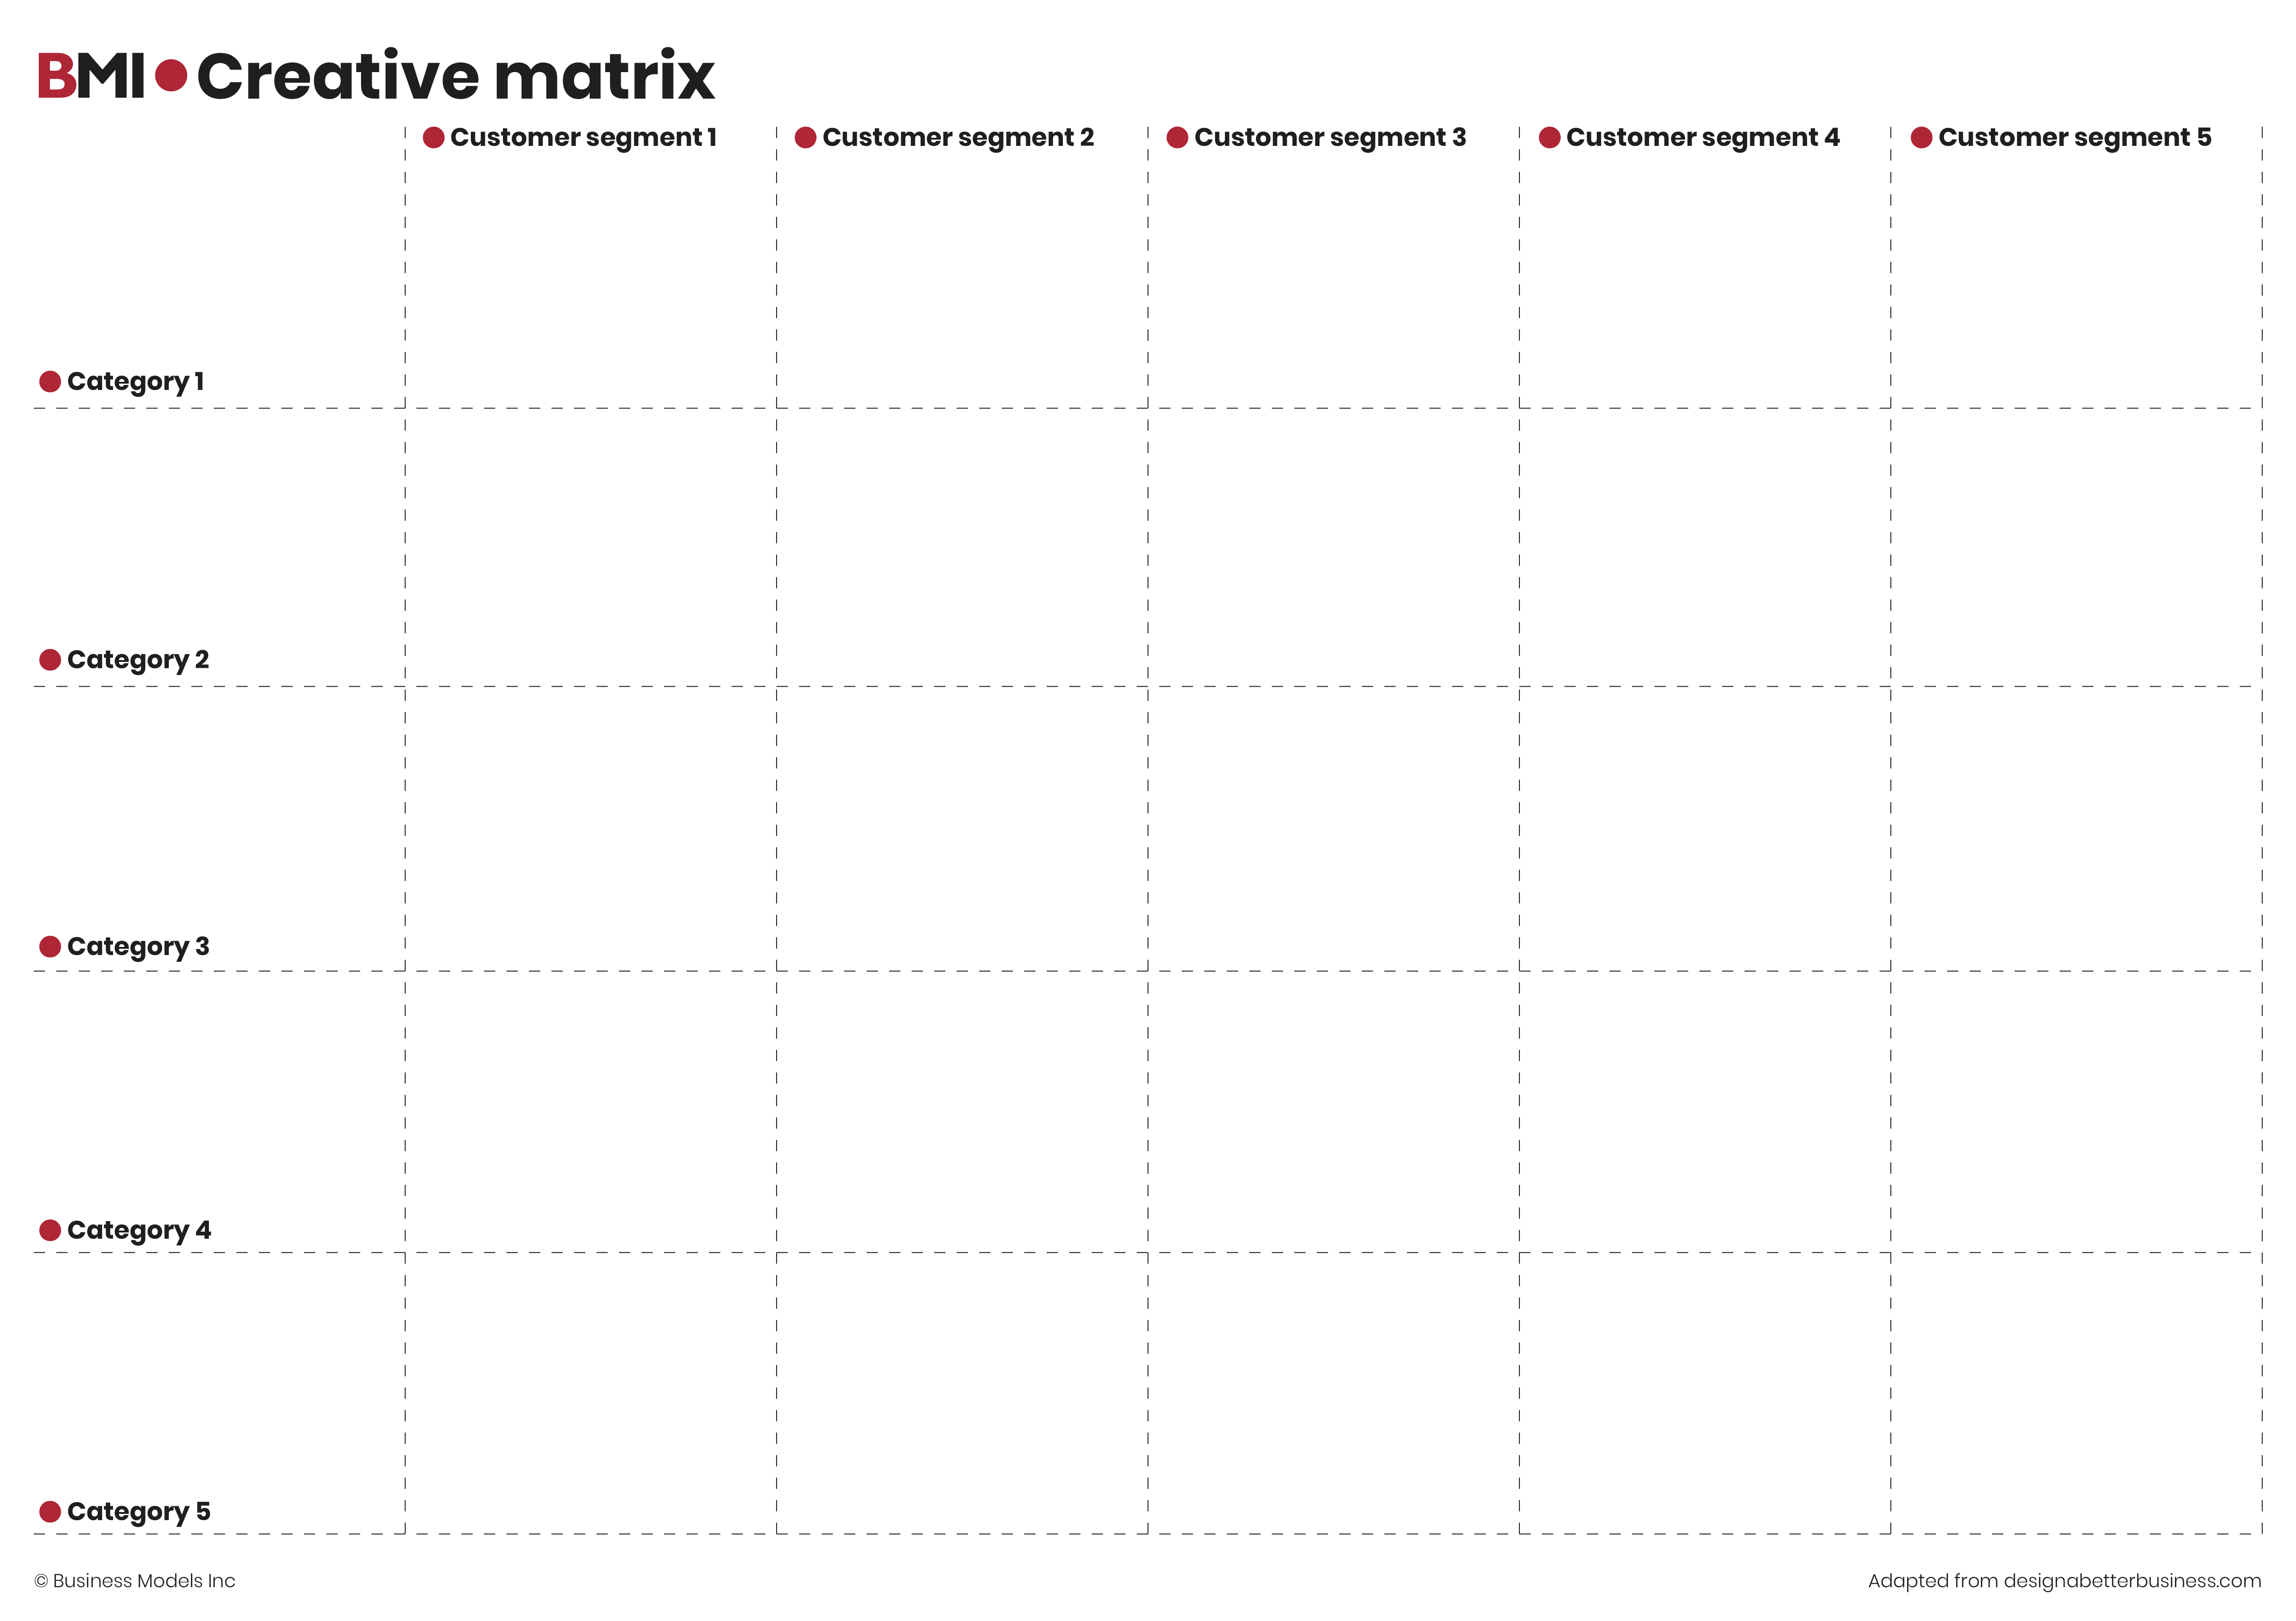 BMI•Creative-matrix